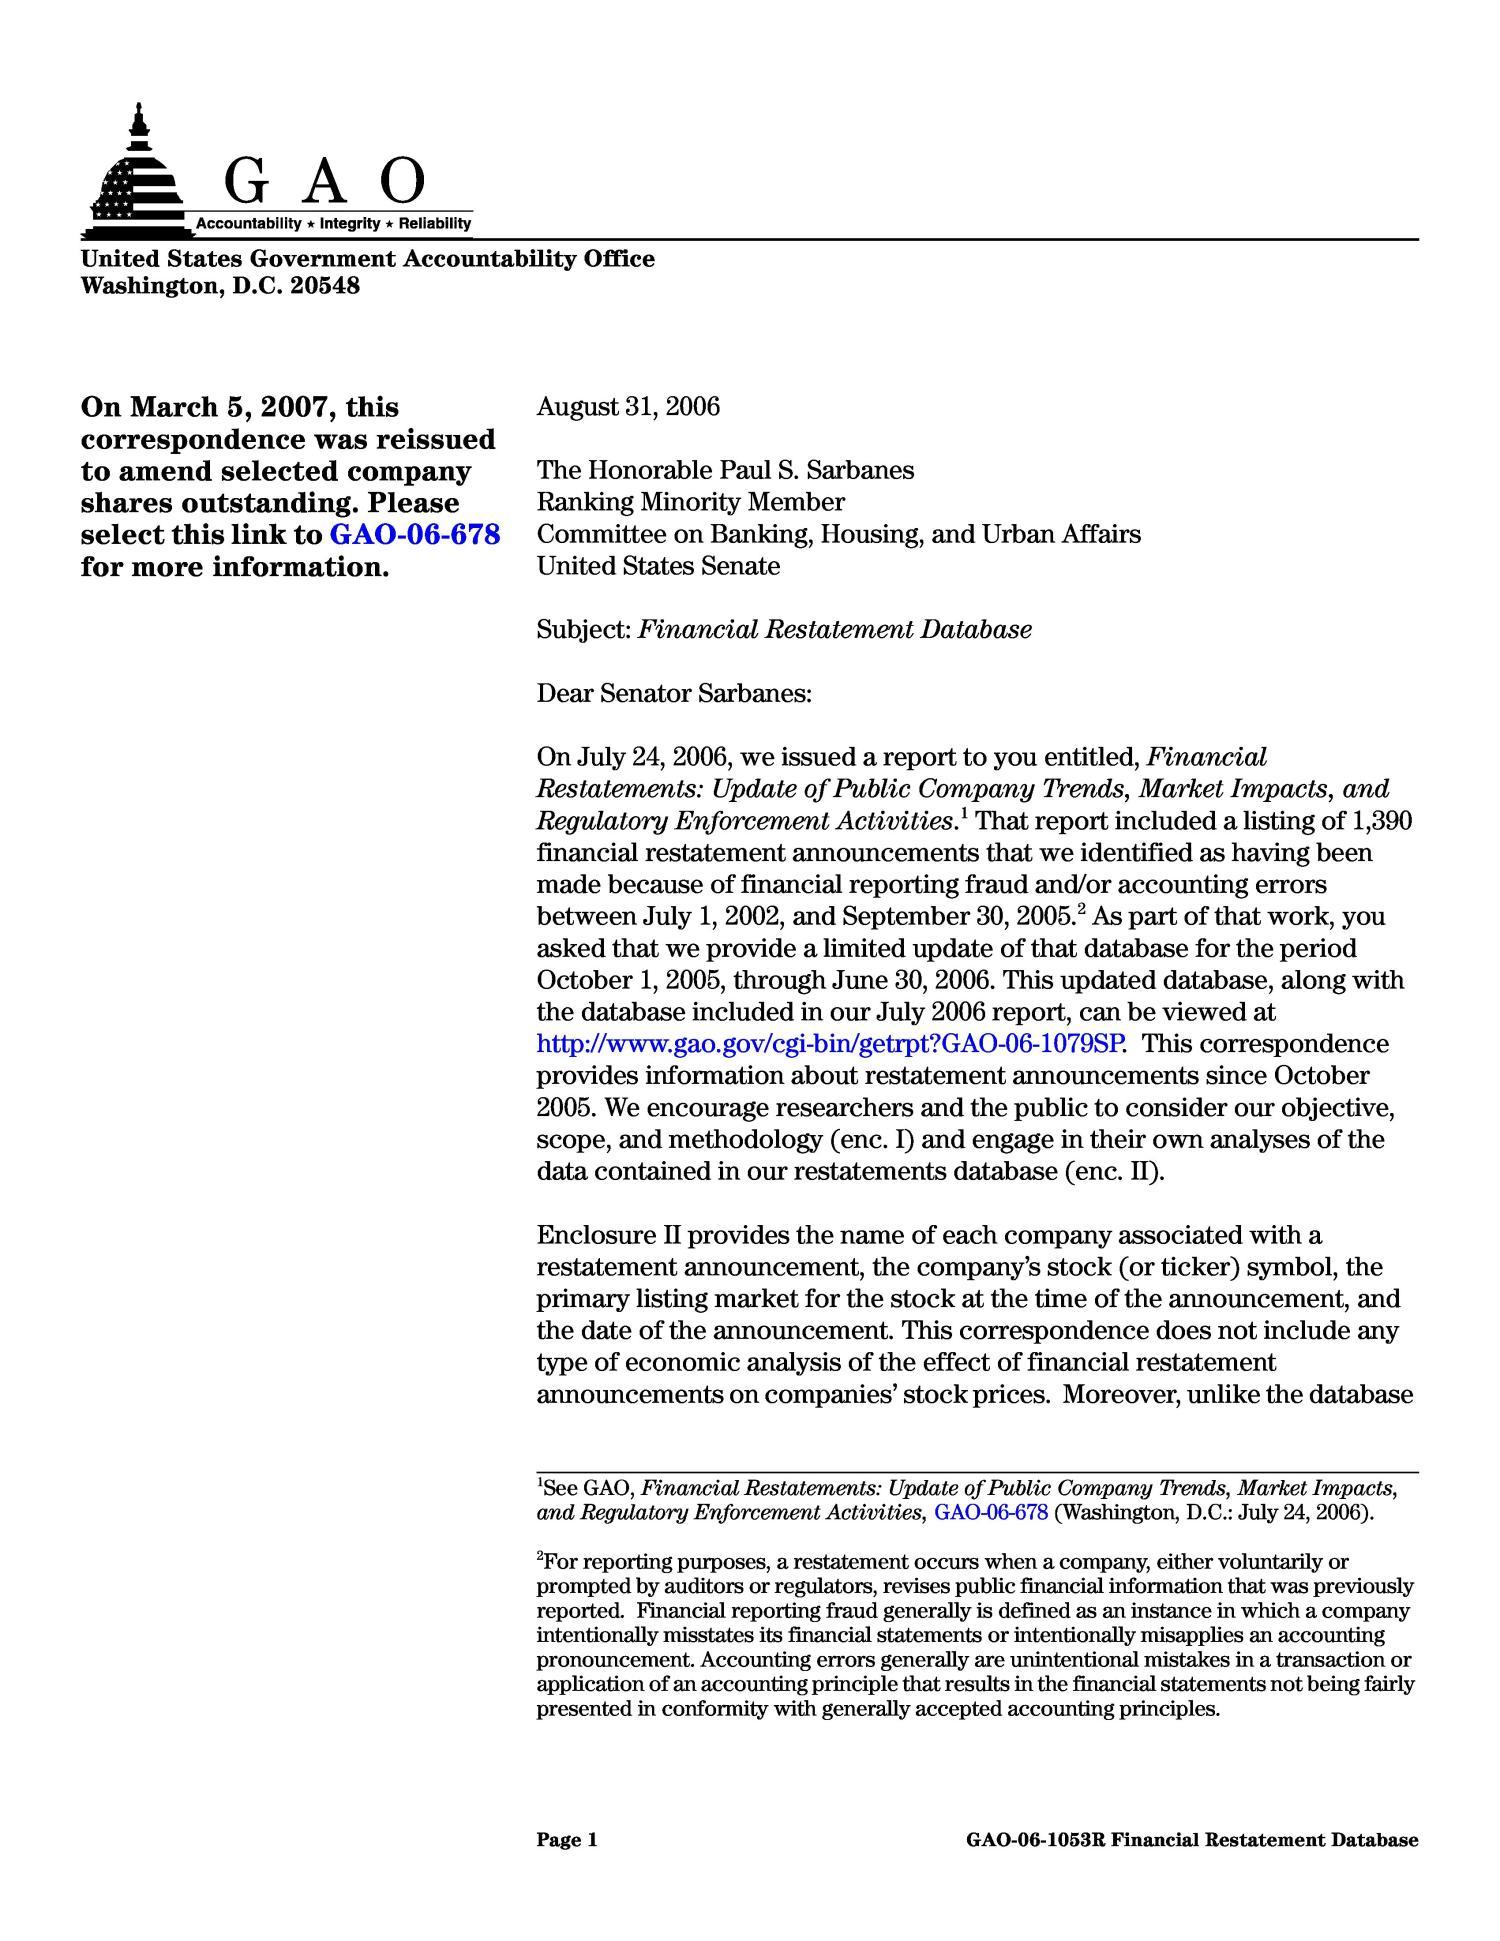 Financial Restatement Database Digital Library